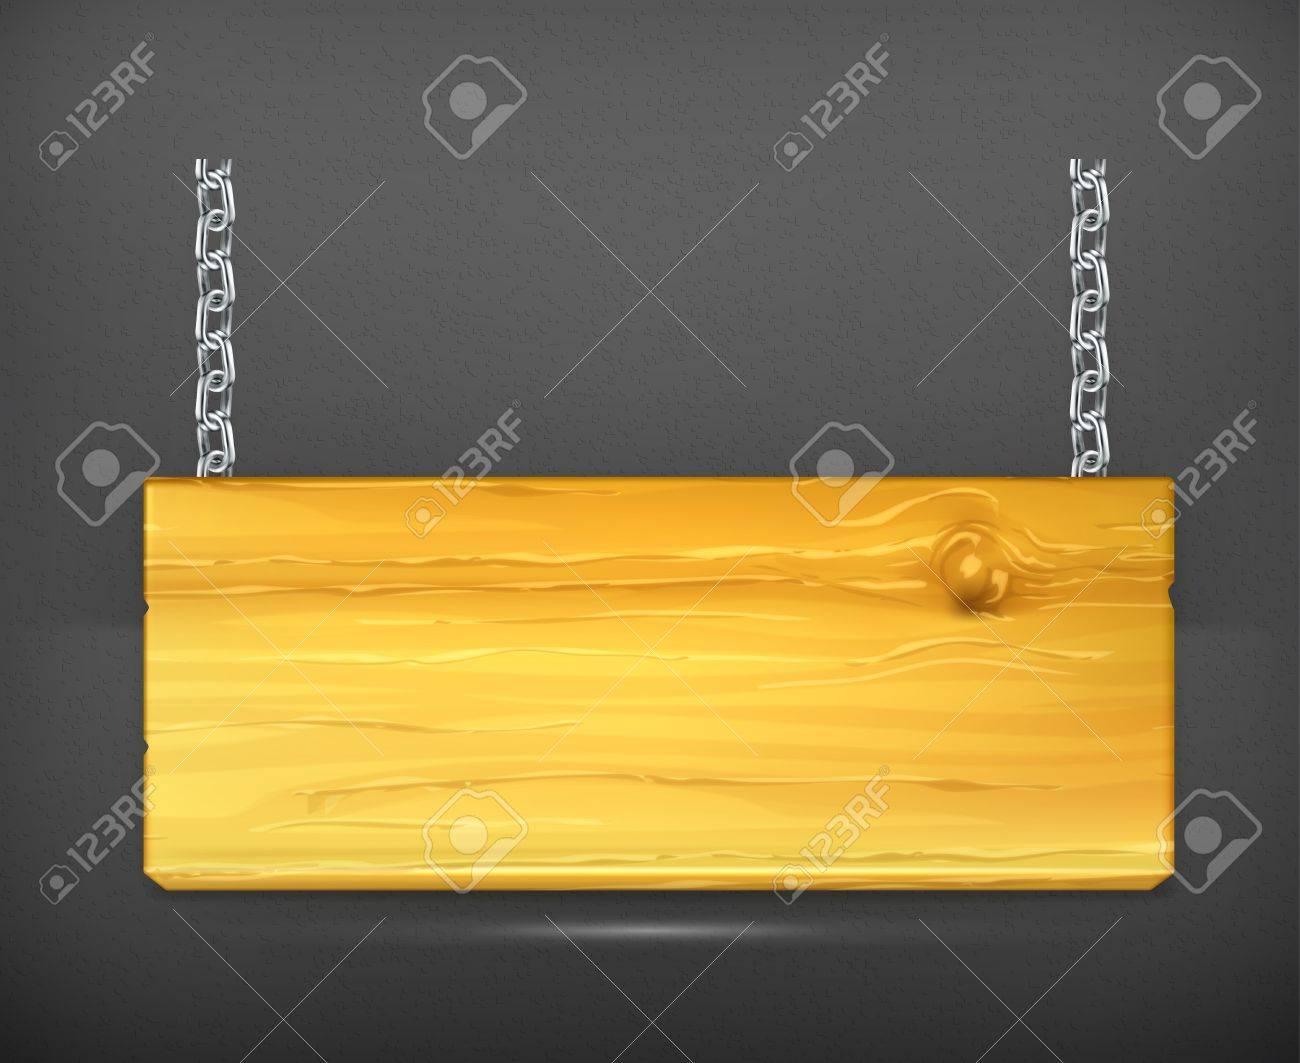 Wooden sign Stock Vector - 19713384